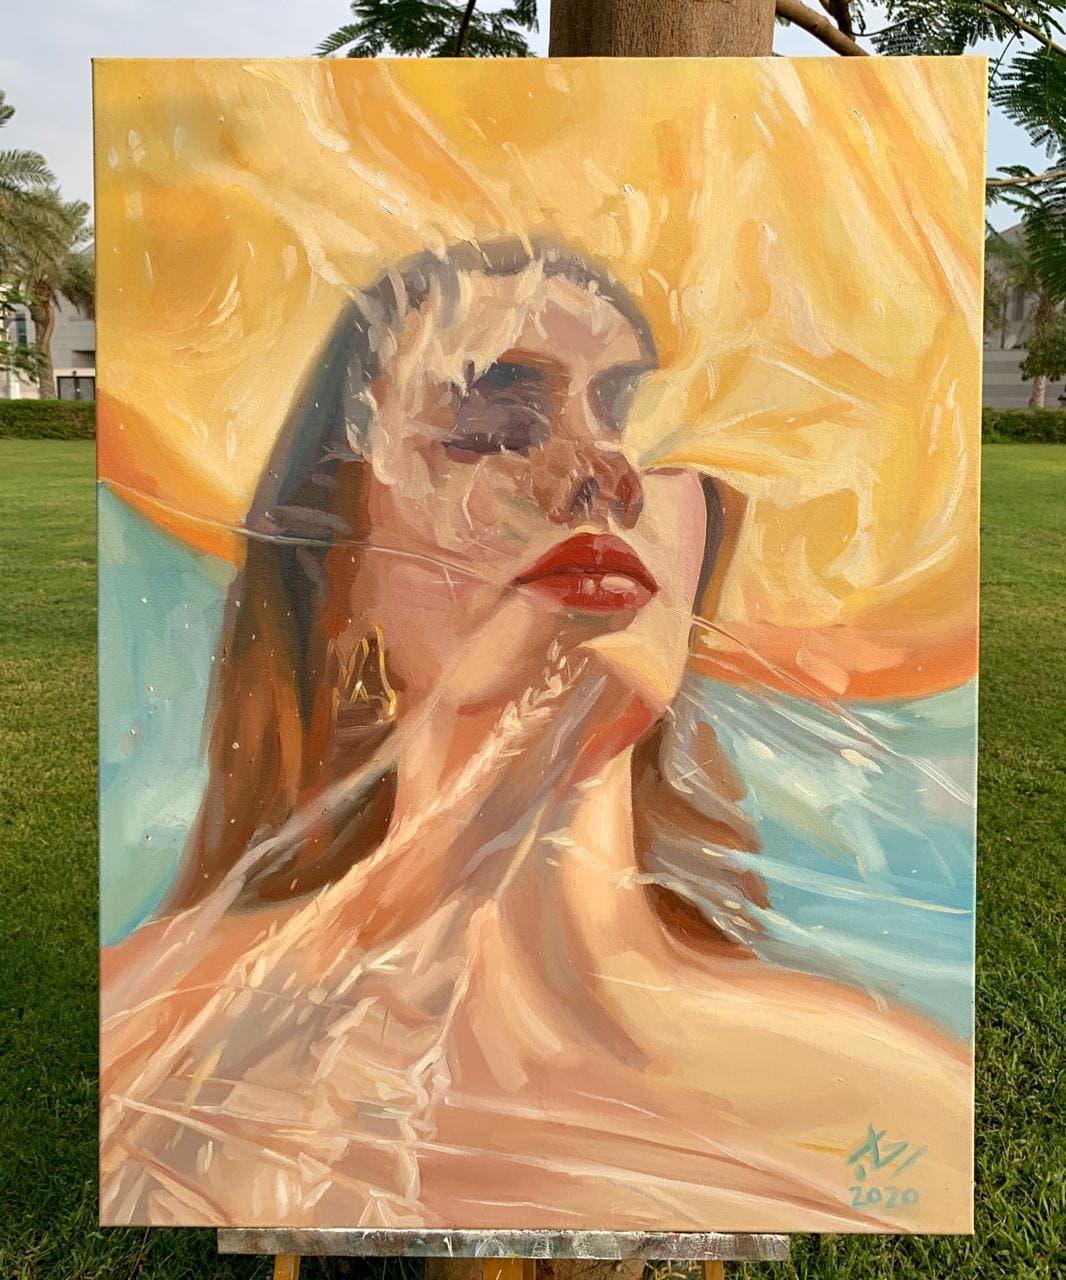 KSA: Saudi artist Painting